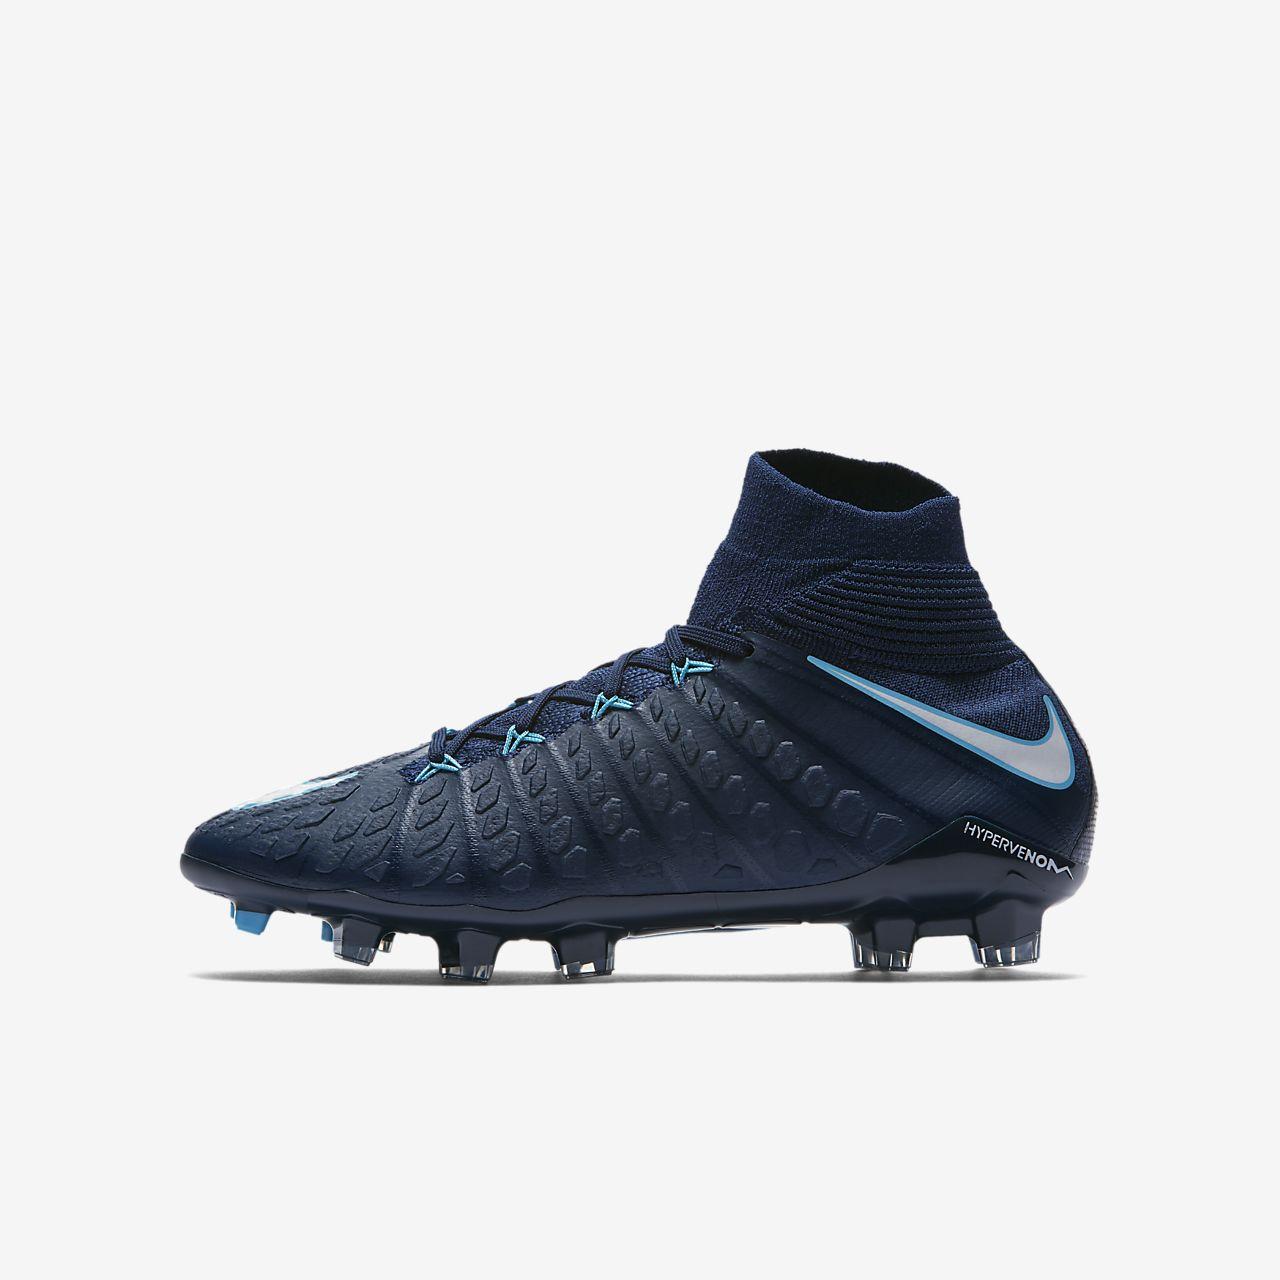 Nike Hypervenom Phantom 3 DF FG - Mens Football Boots - Blue/Navy